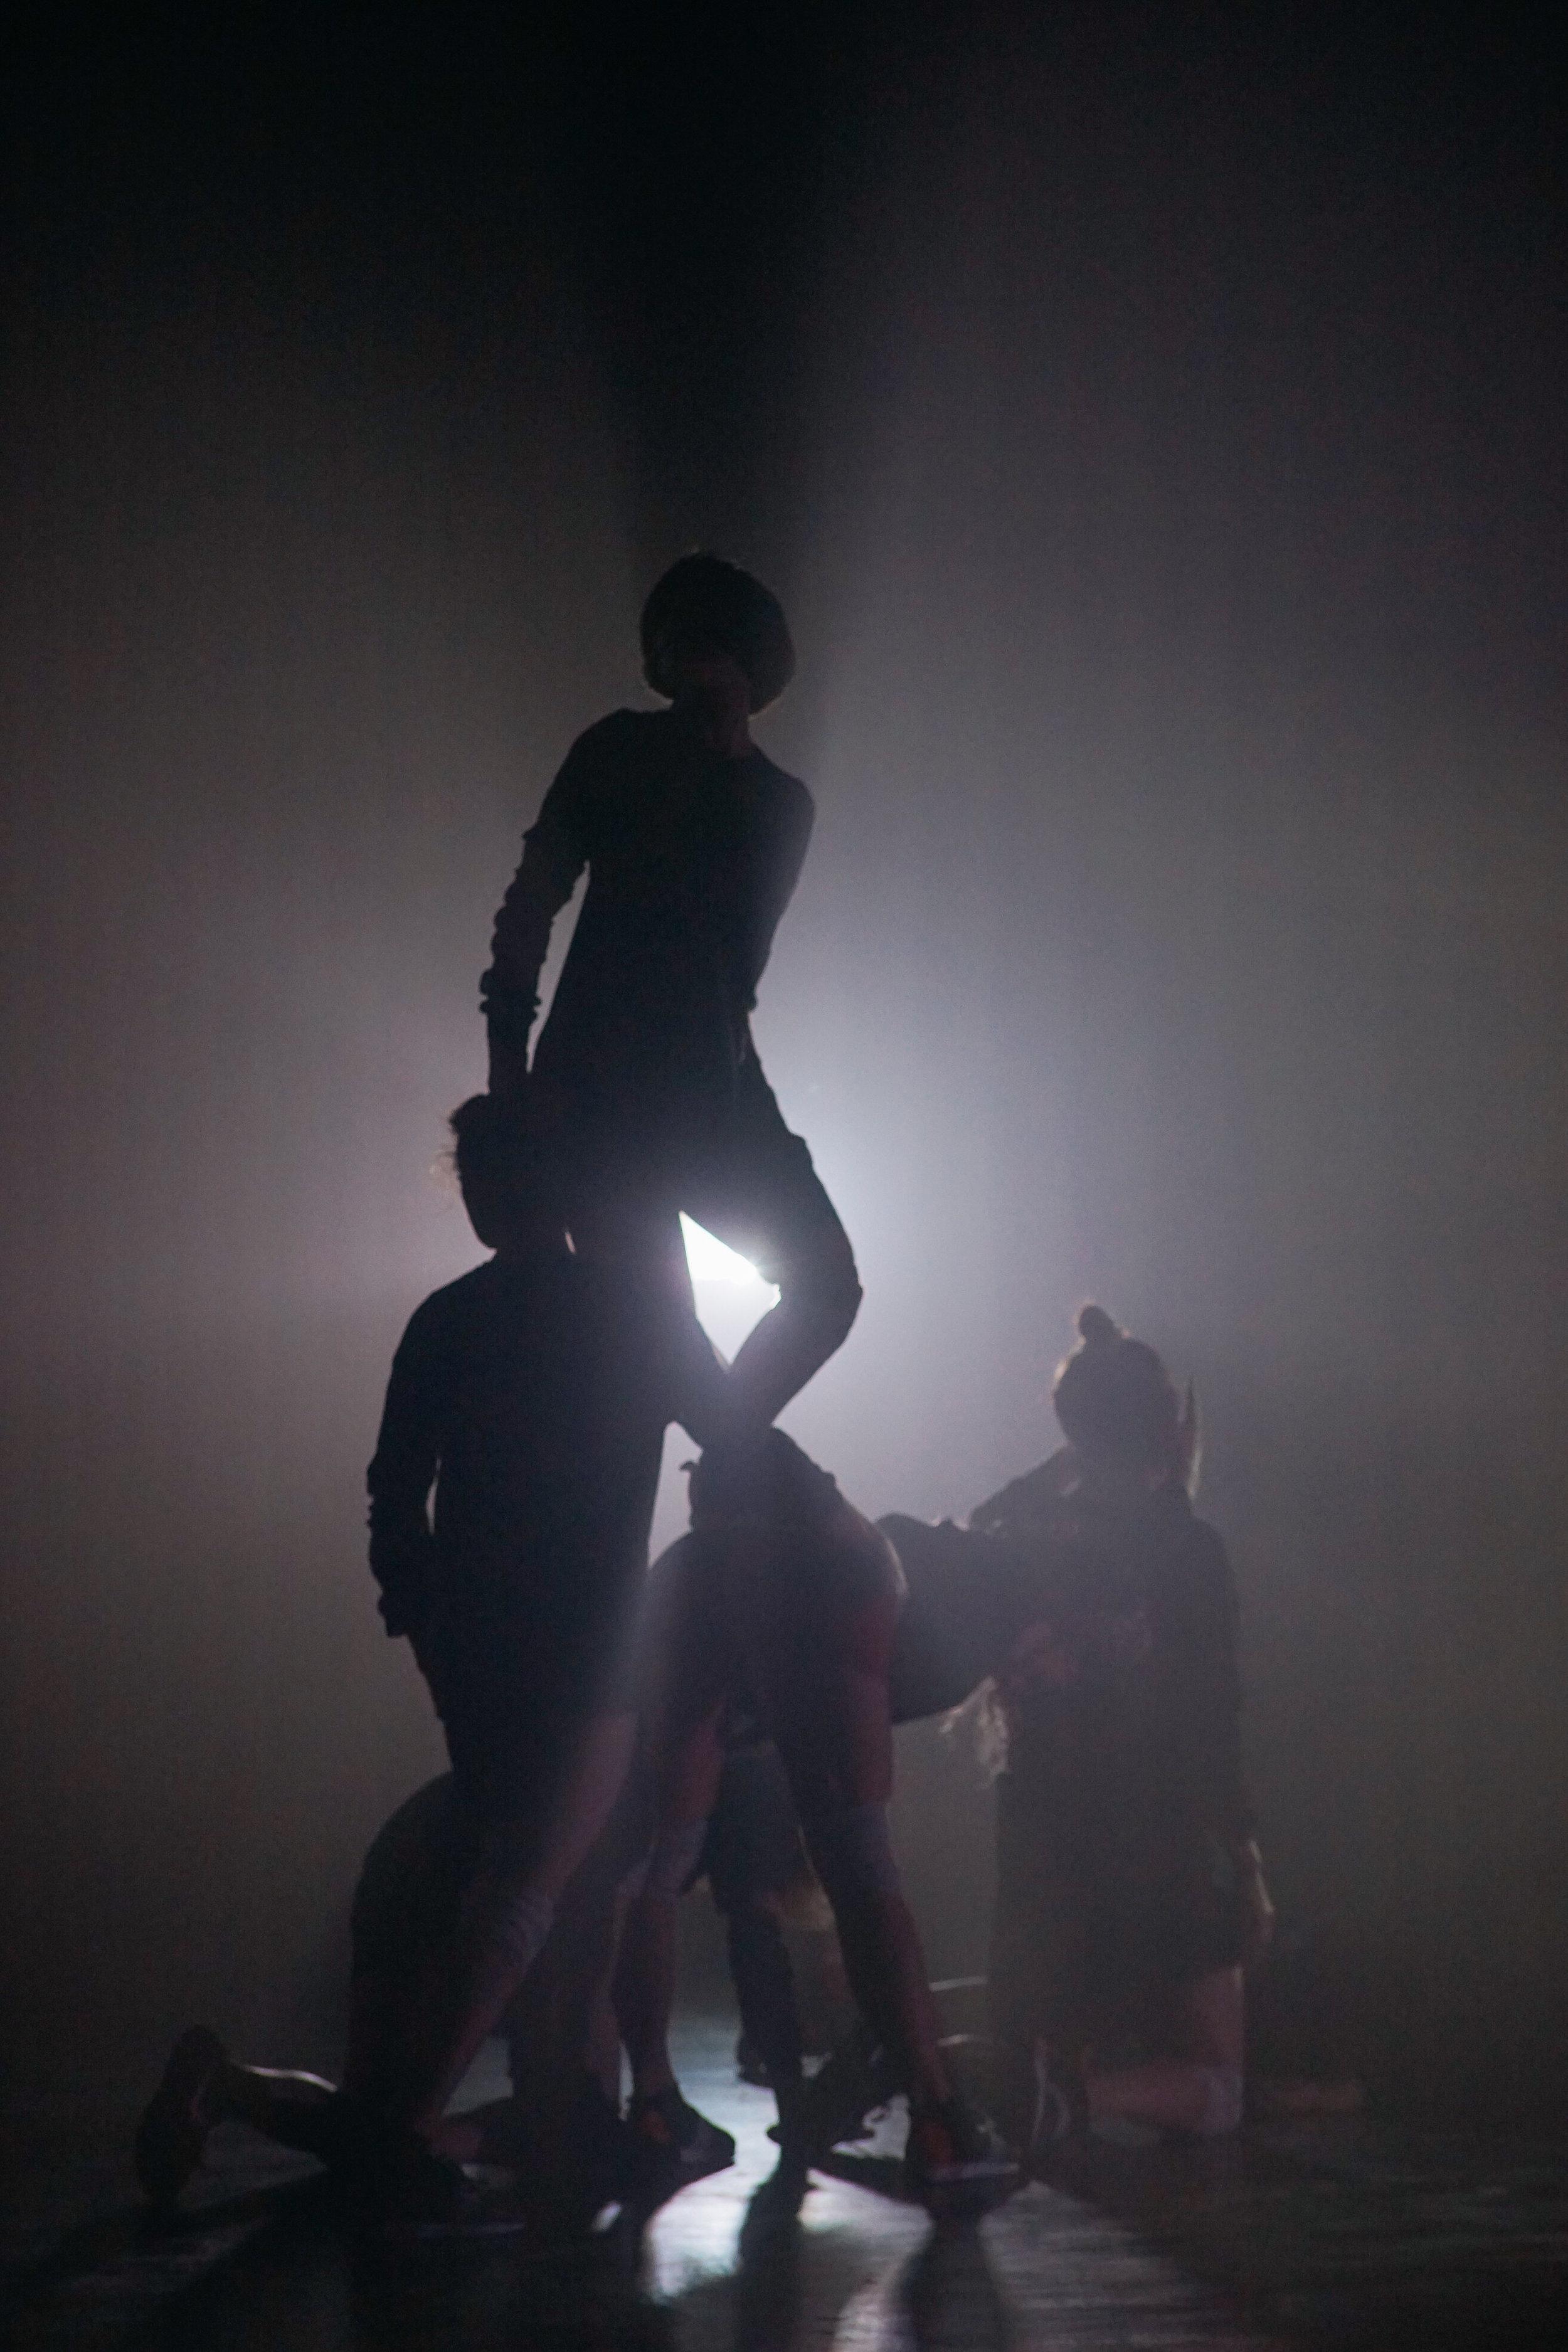 Dancers: Taryn Lavery, Sarah Navarrete, Hailley Lauren, Katie Hopkins